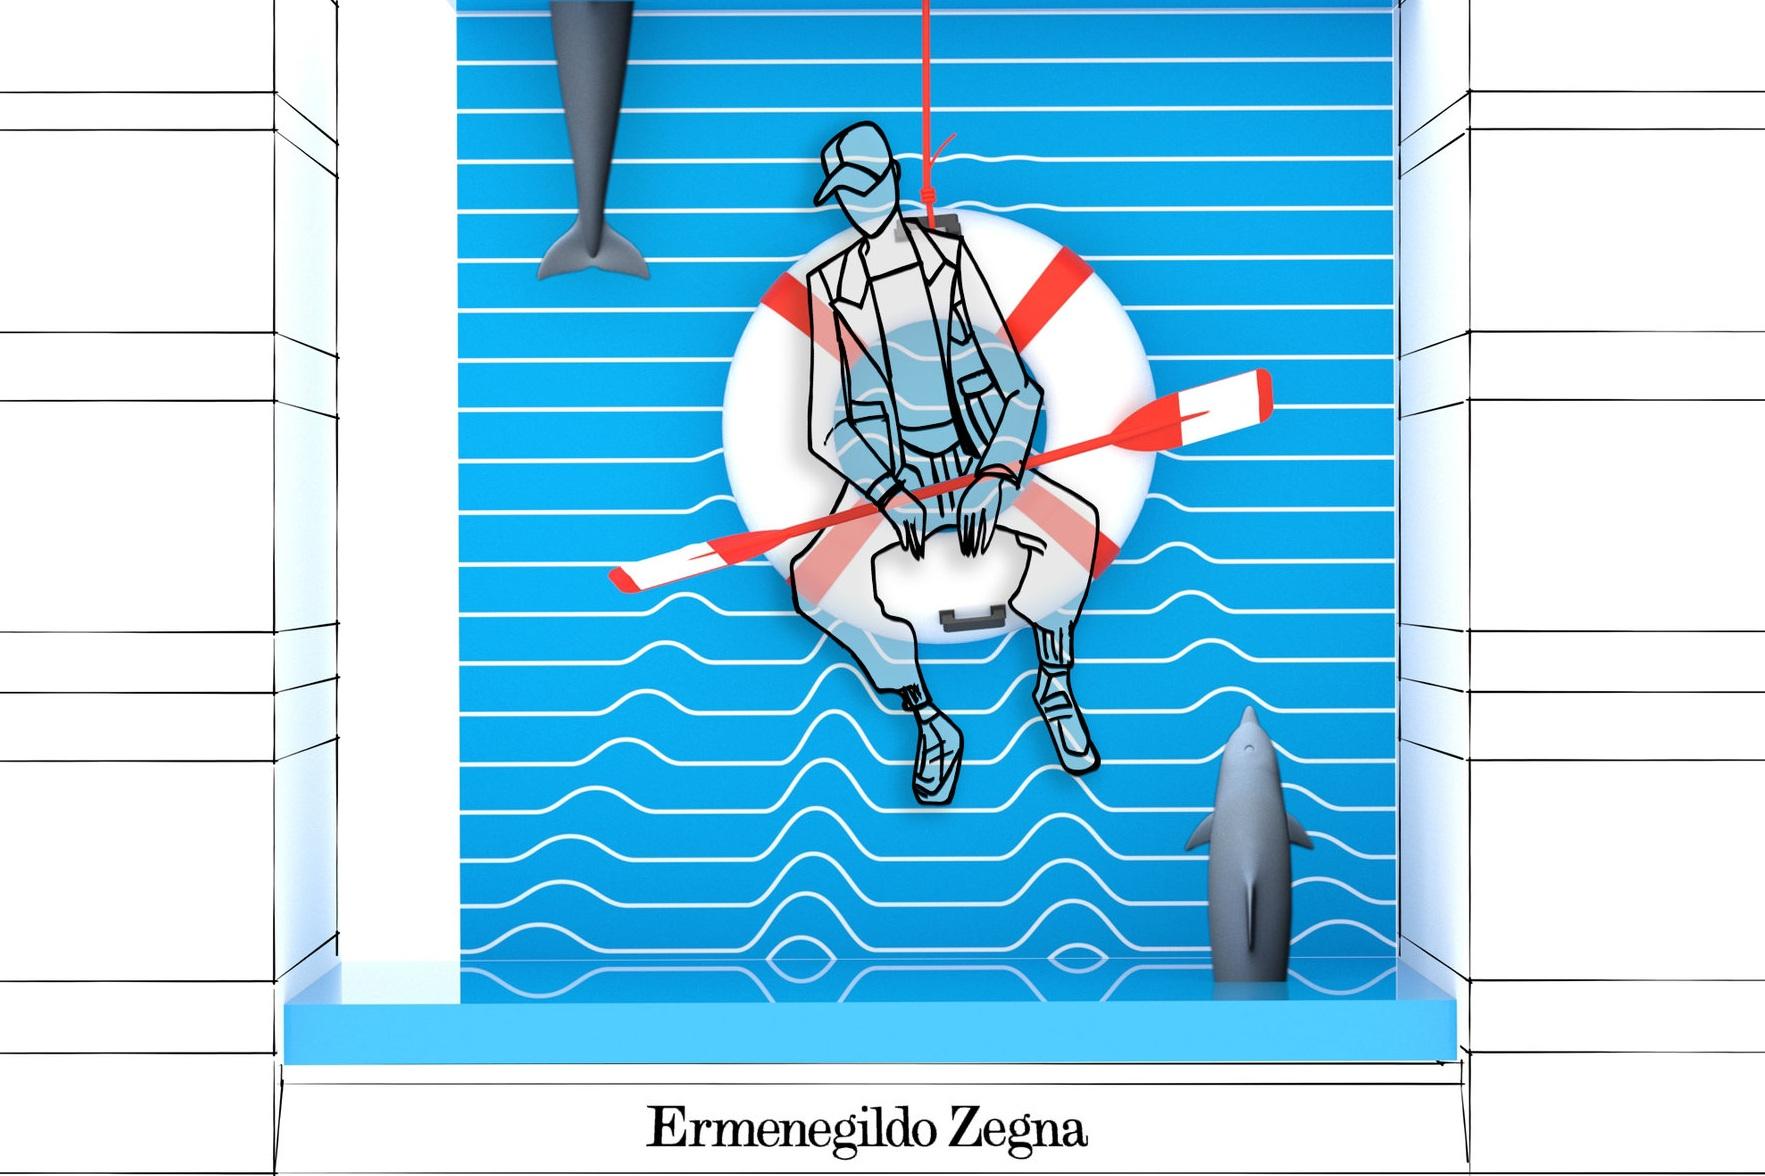 Zegna_TM_Retail_Windows_002.jpg